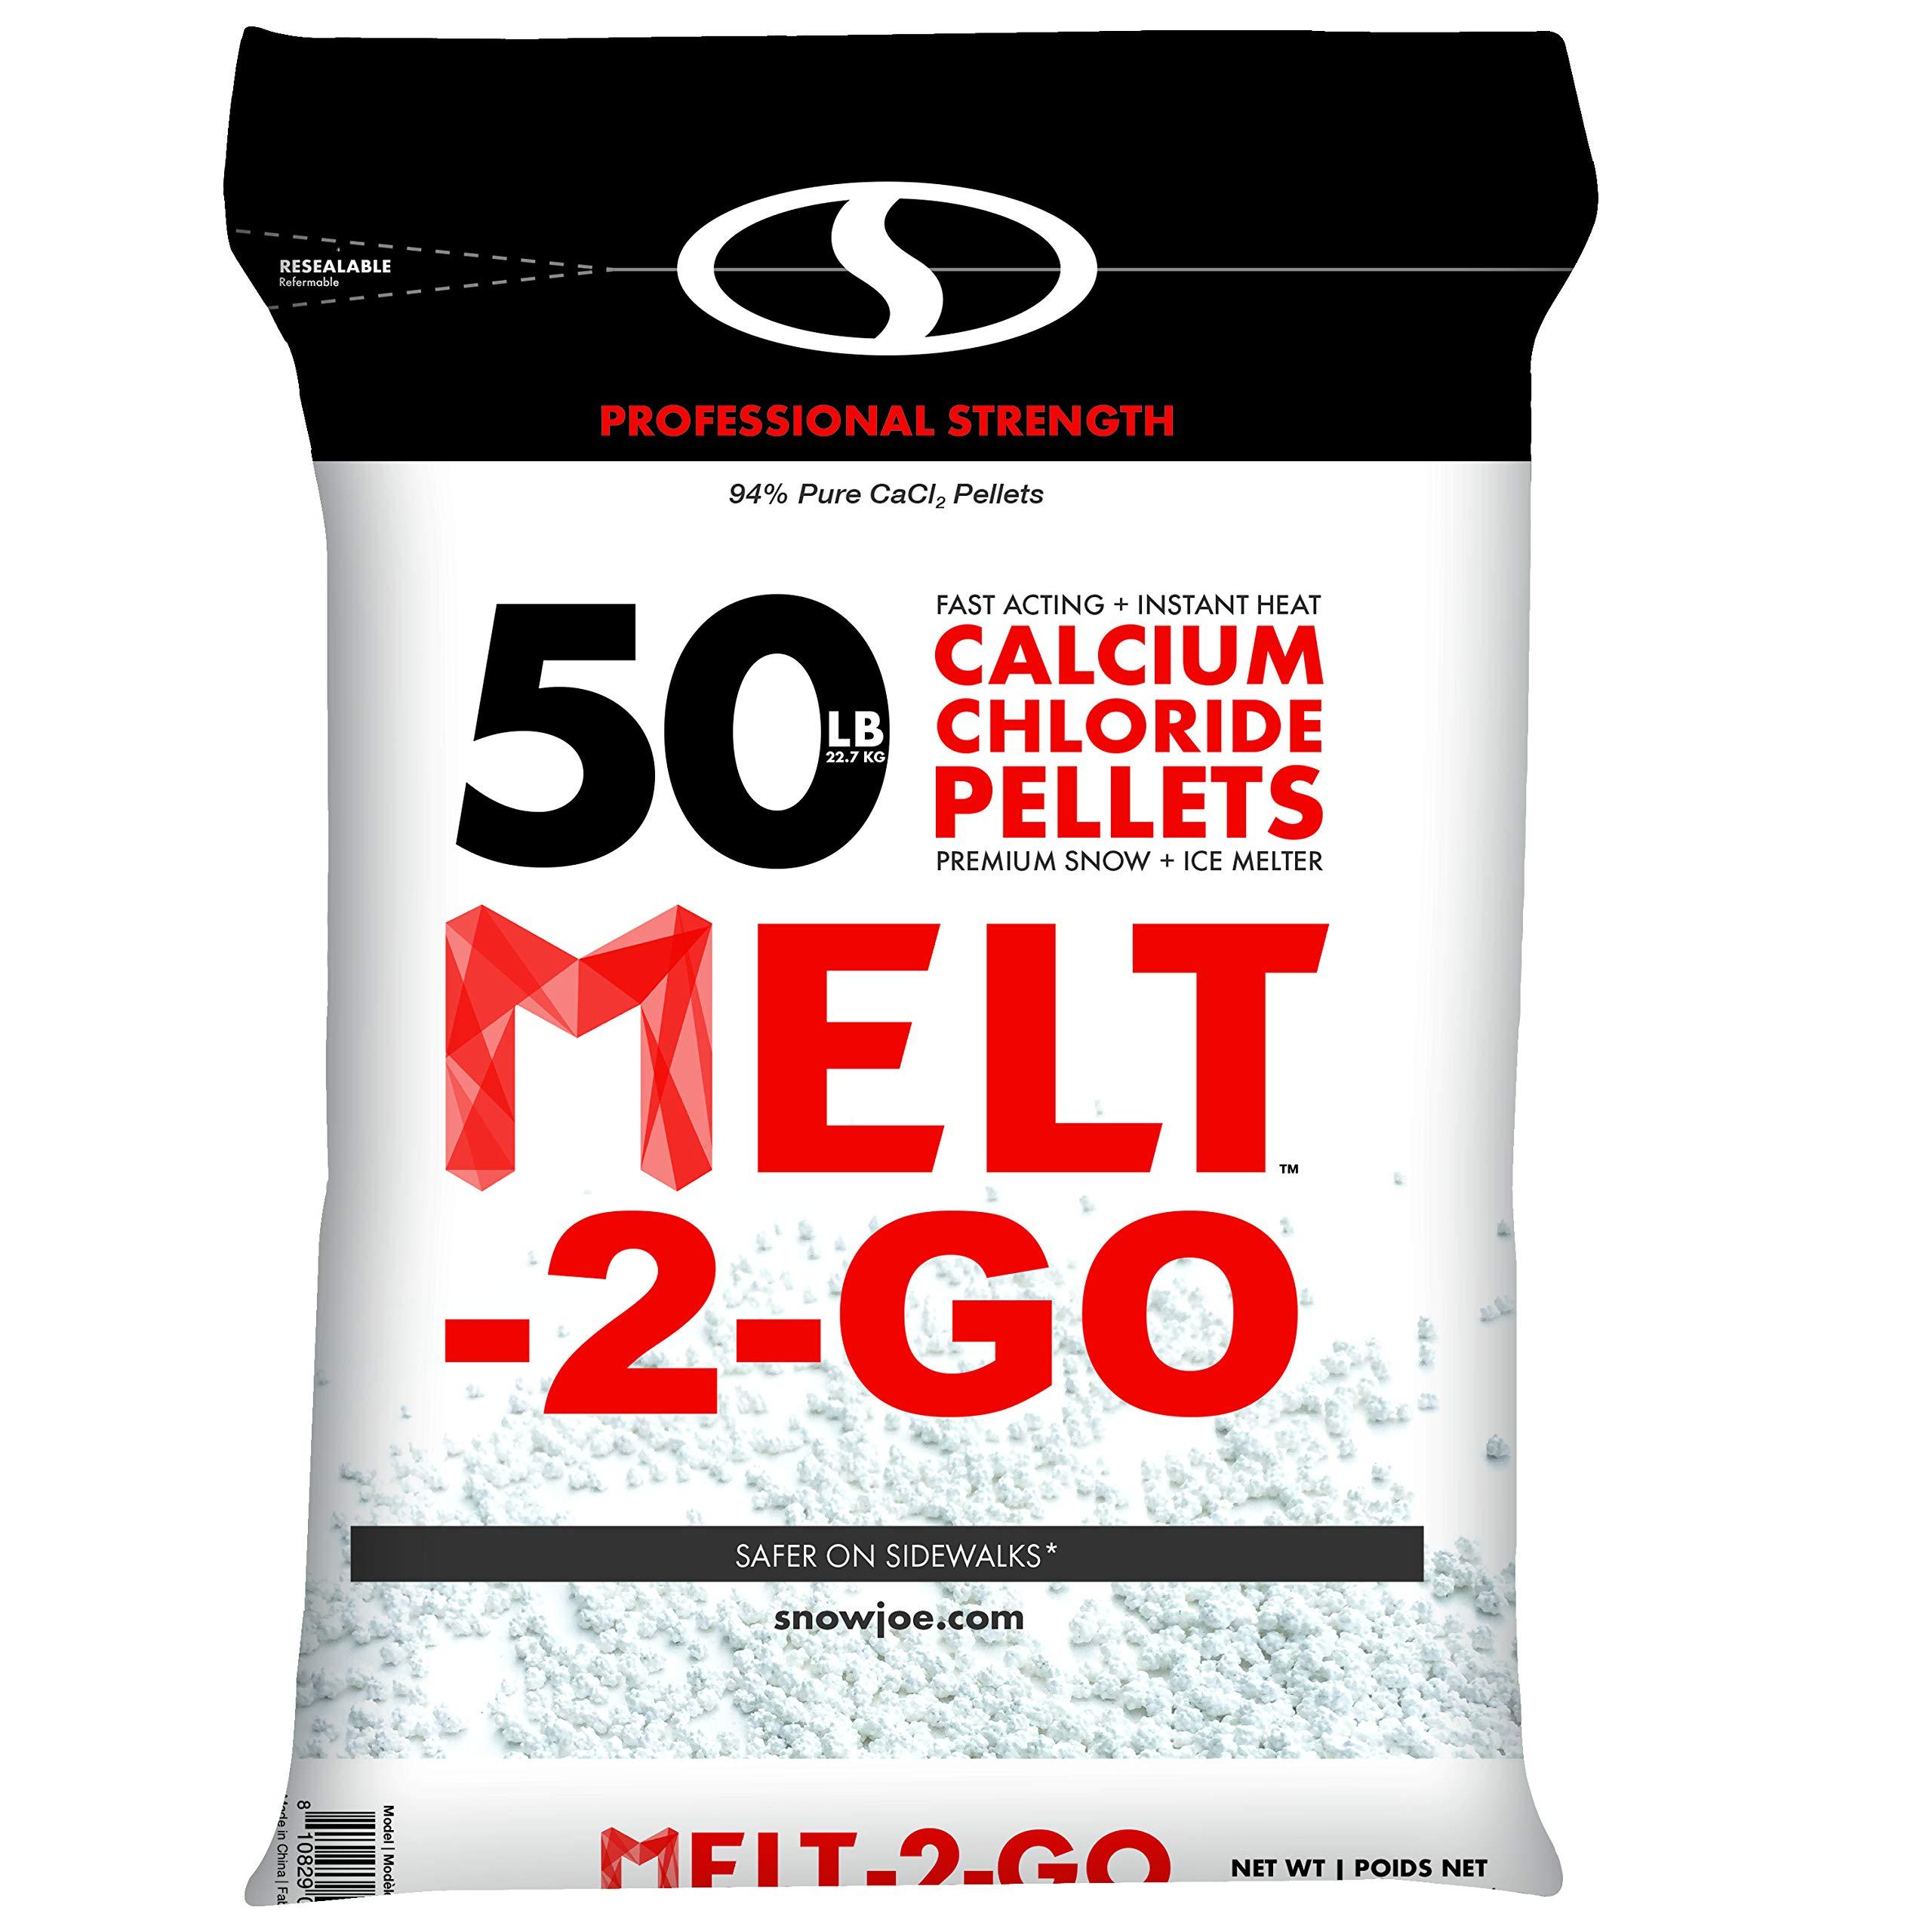 Snow Joe AZ-50-CCP Melt-2-Go 94% Pure Calcium Chloride Pellet Ice Melter, 50-lb Resealable Bag by Snow Joe